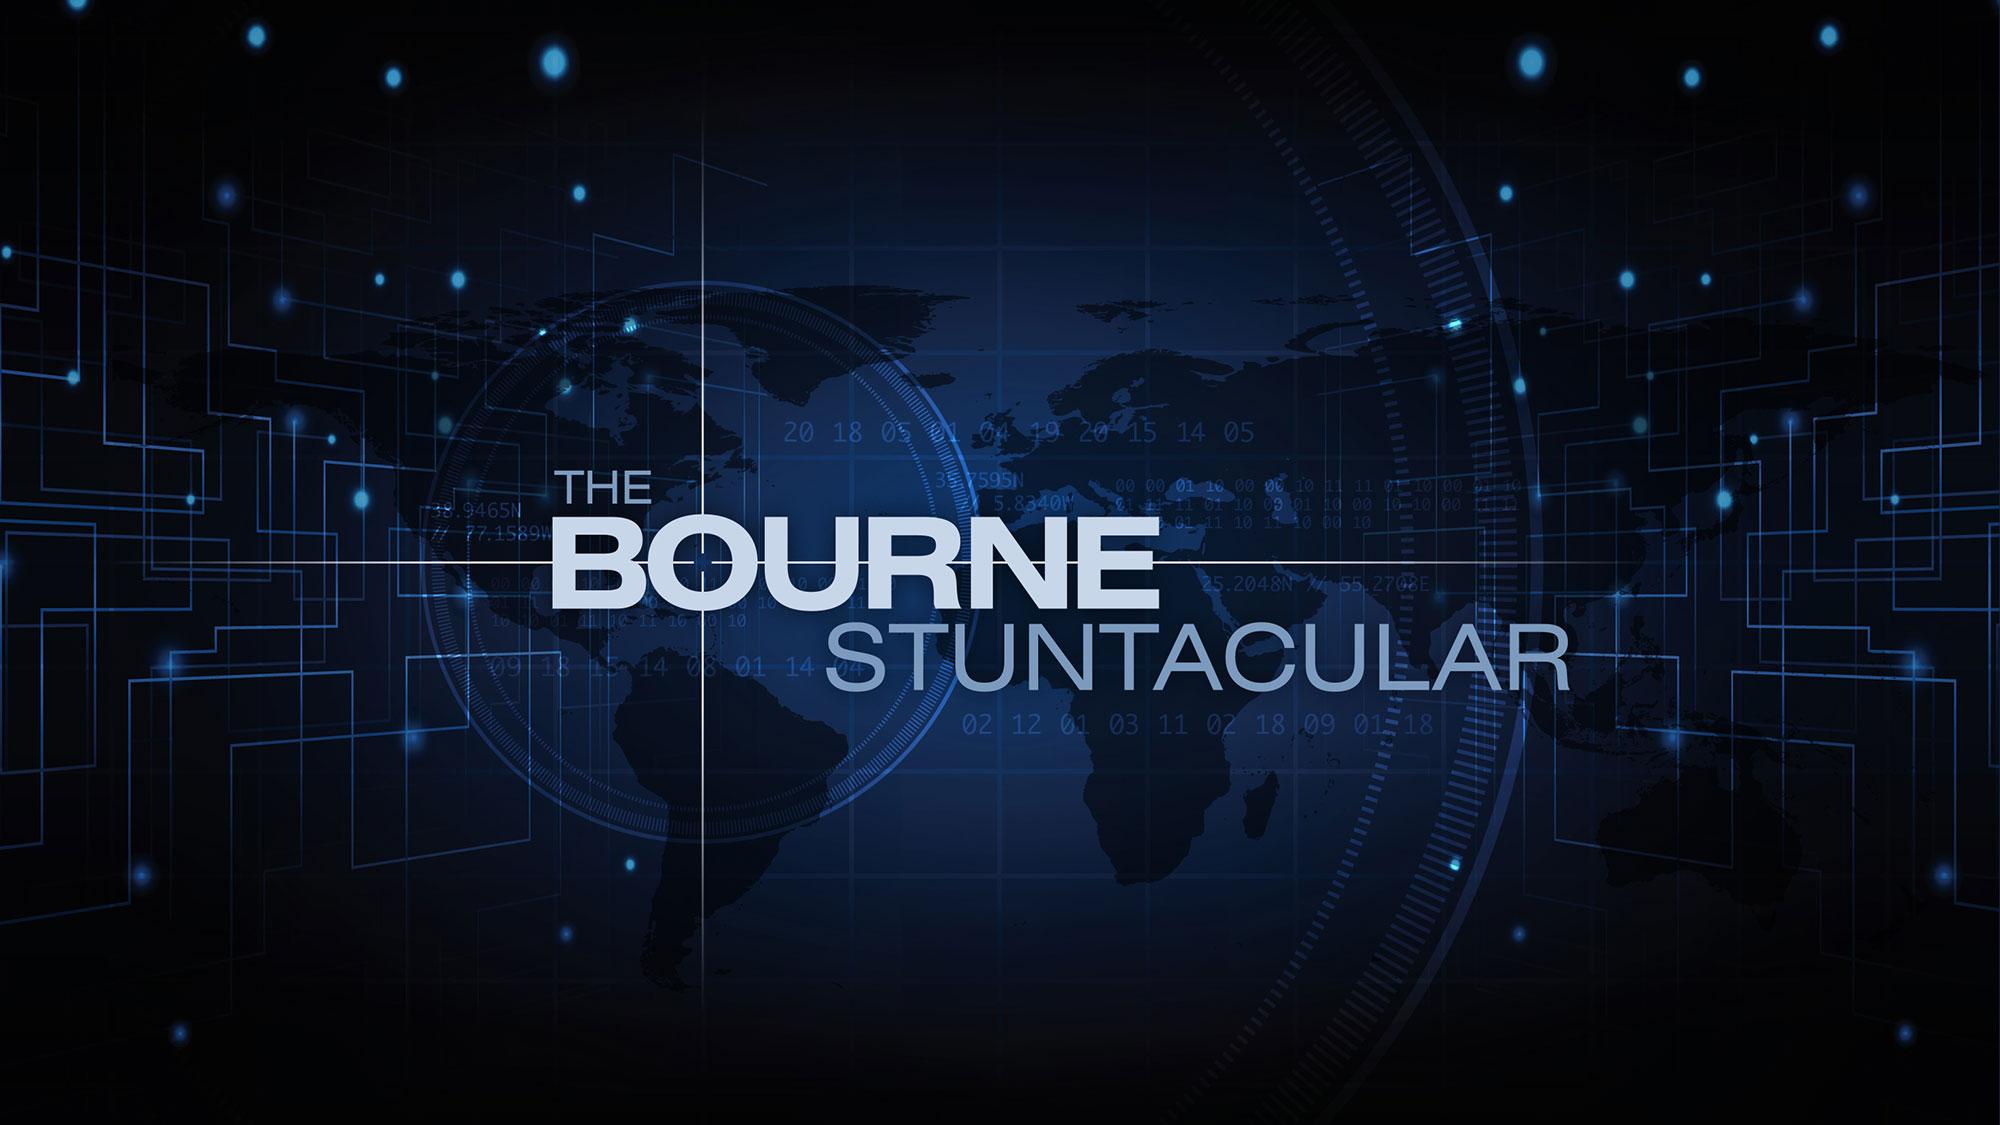 Universal Orlando to feature Bourne stunt show